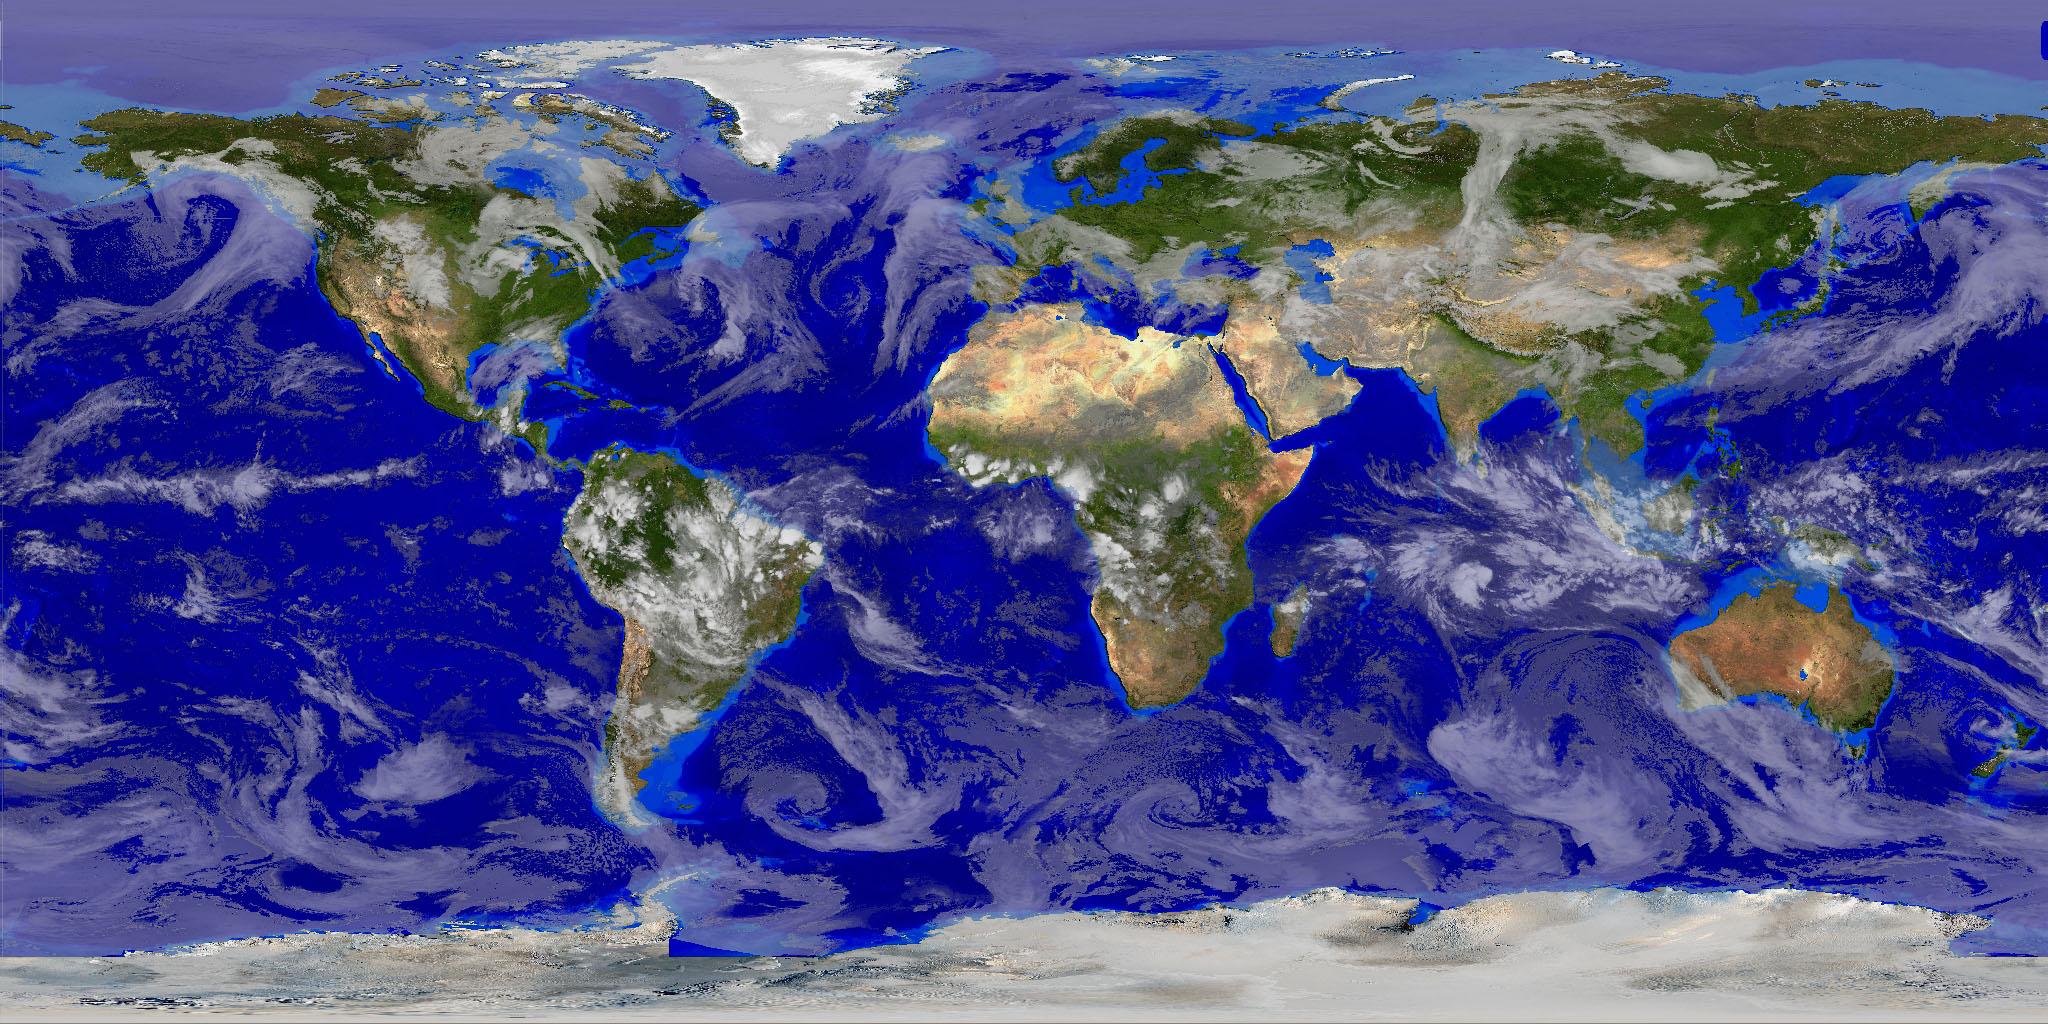 Mintel : Global Pulse Monitor